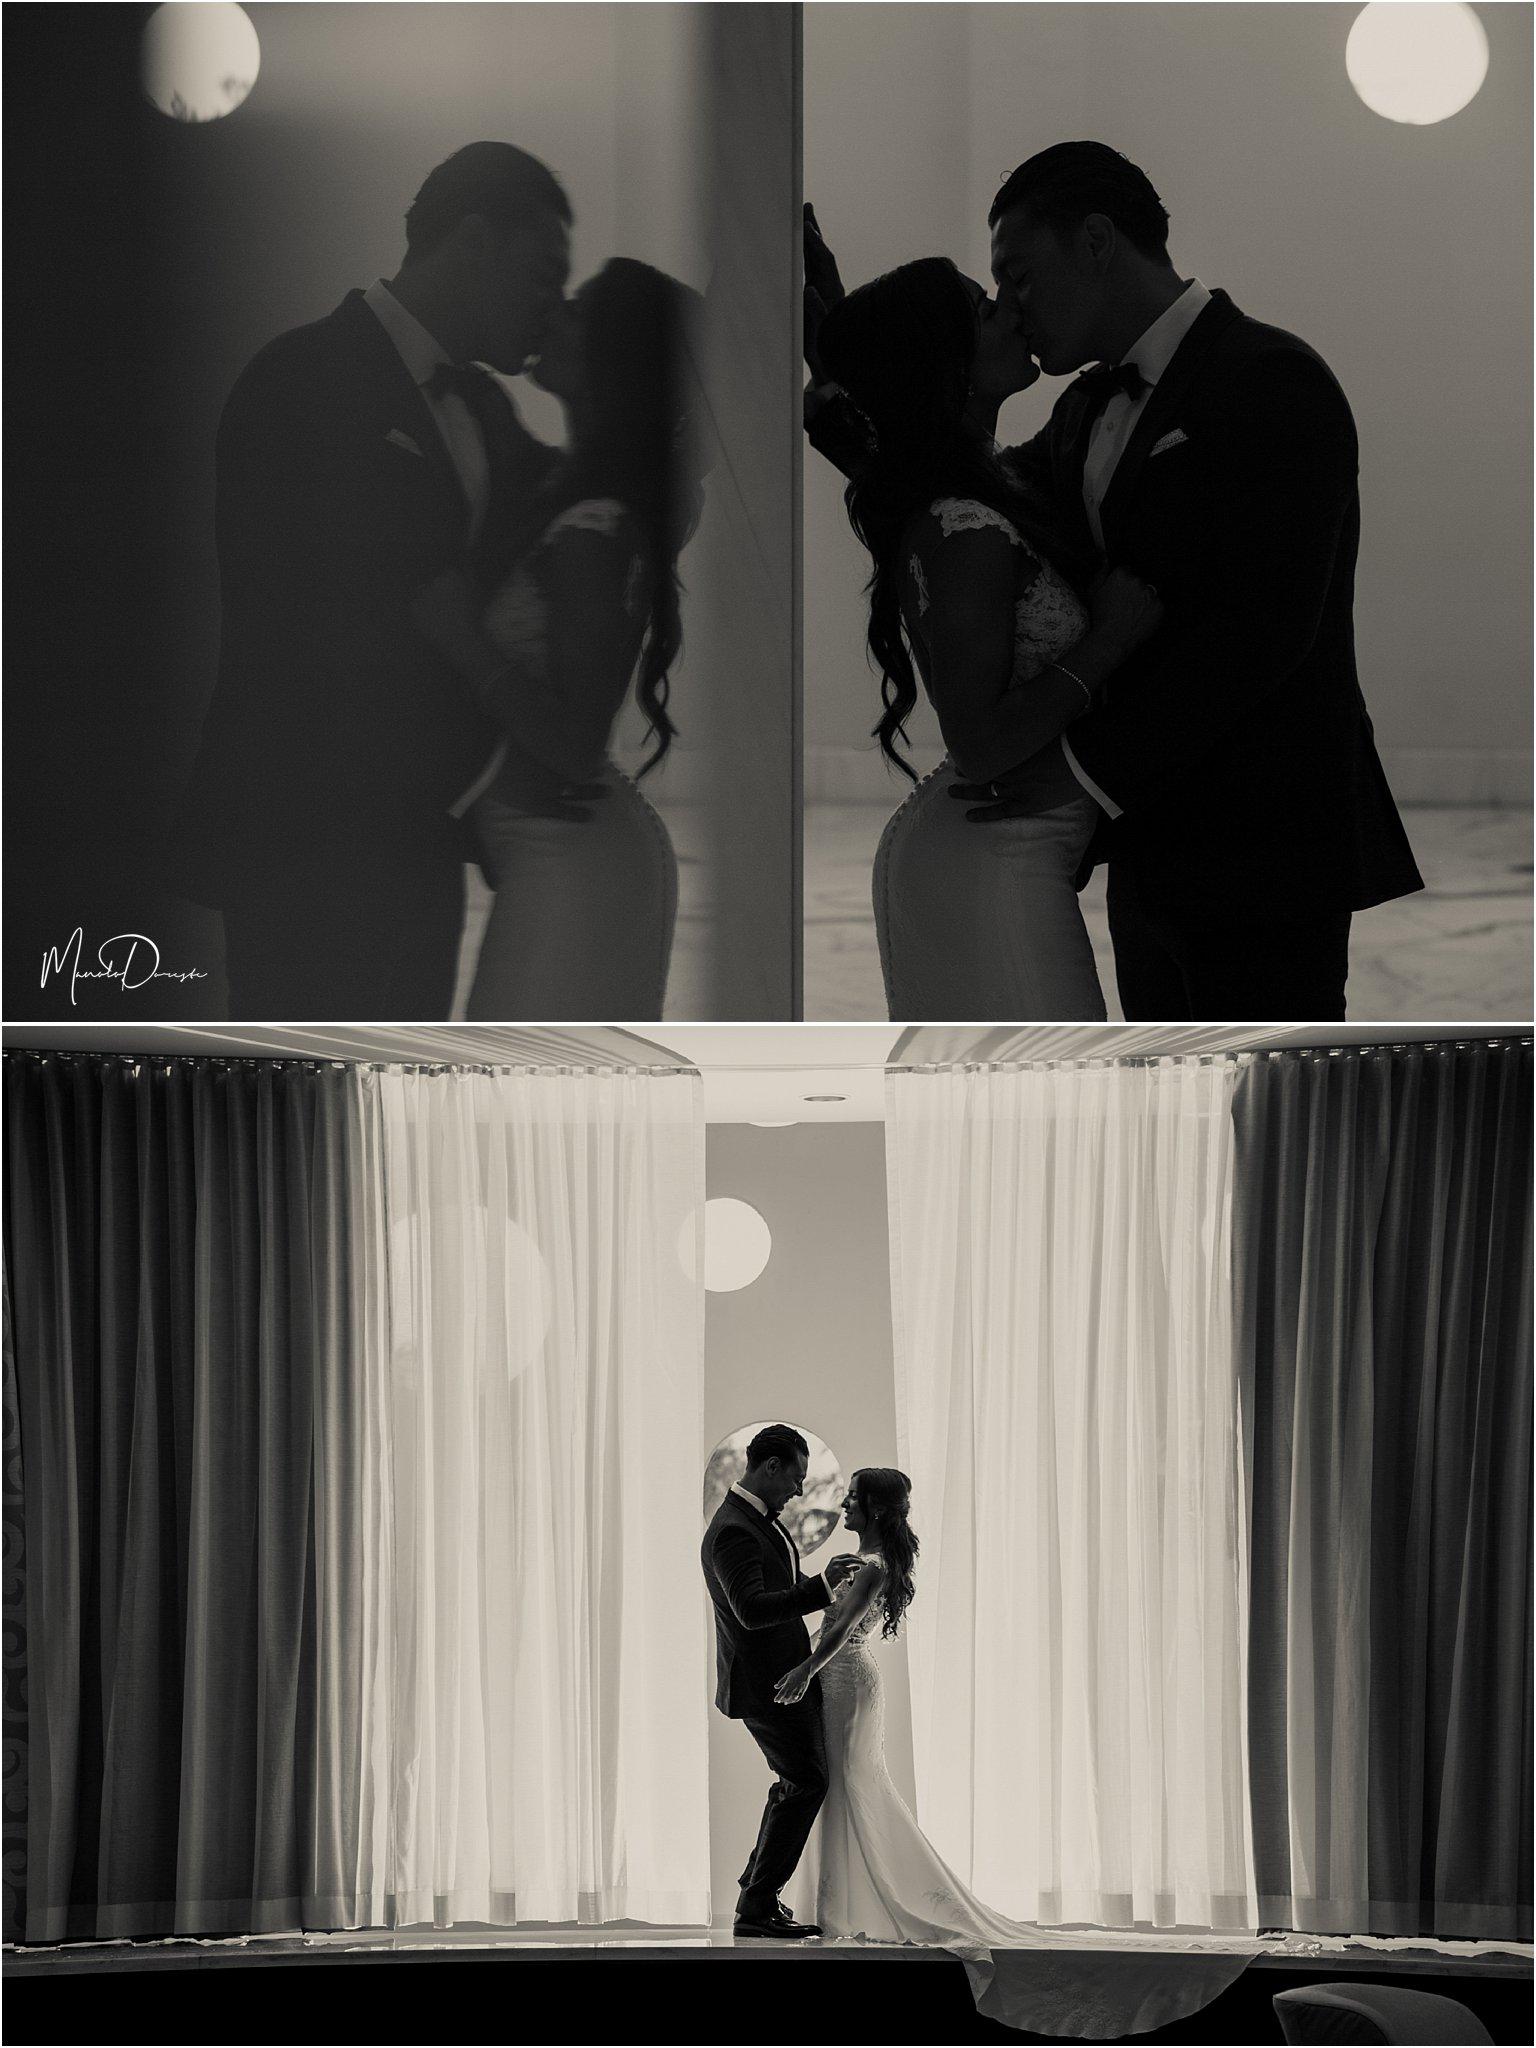 0334_ManoloDoreste_InFocusStudios_Wedding_Family_Photography_Miami_MiamiPhotographer.jpg